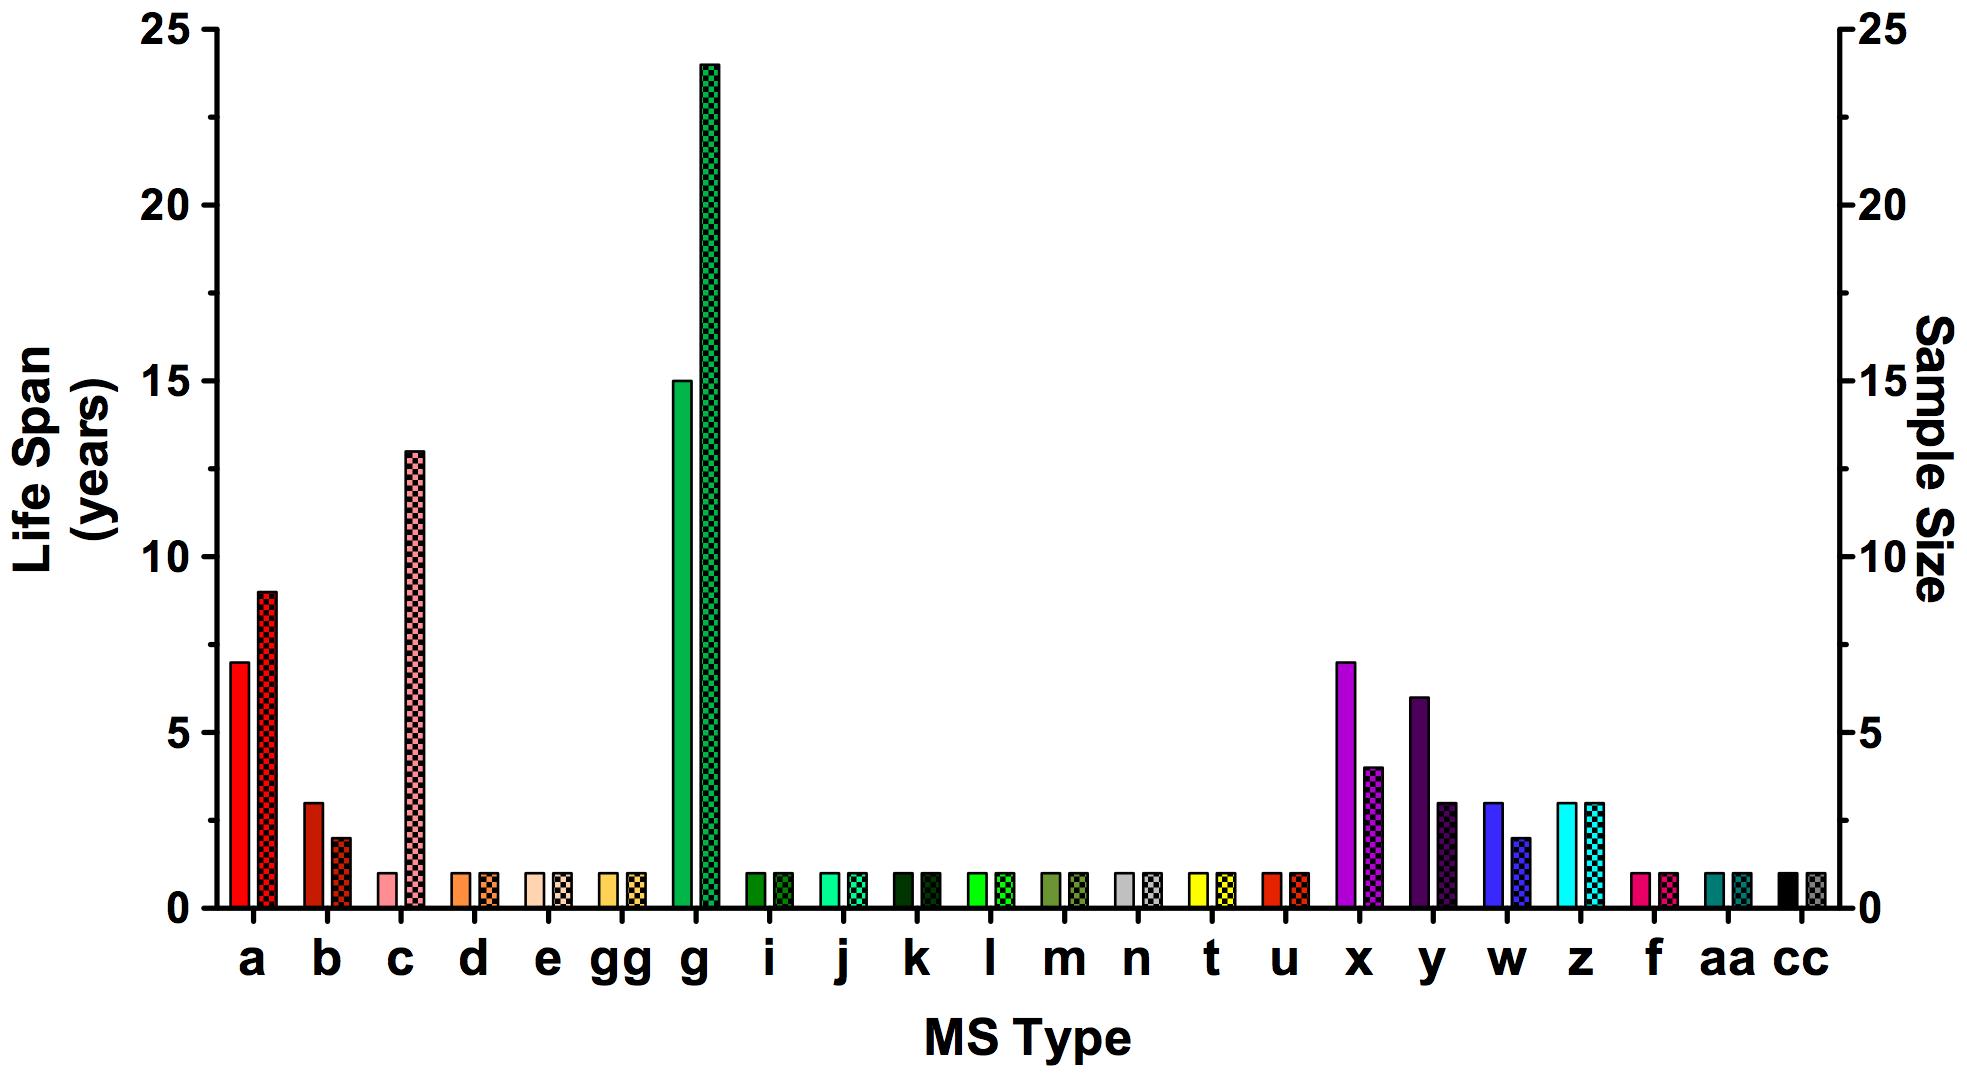 <i>Sarocystis neurona</i> MS type lifespan and sample size in California.